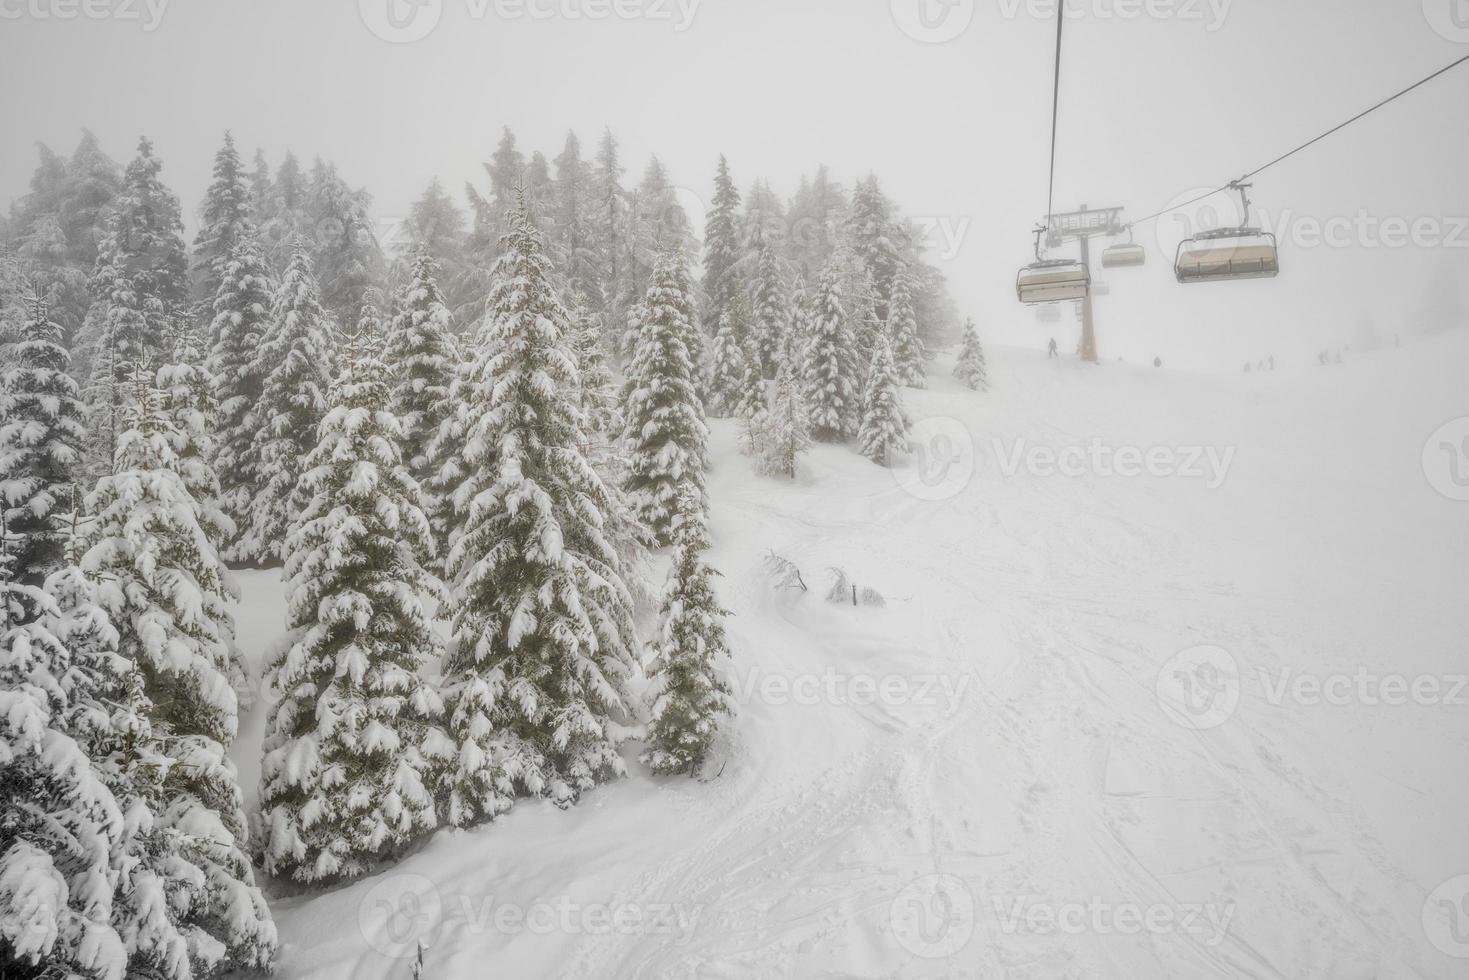 Chairlift in snowfall at alpine ski resort photo